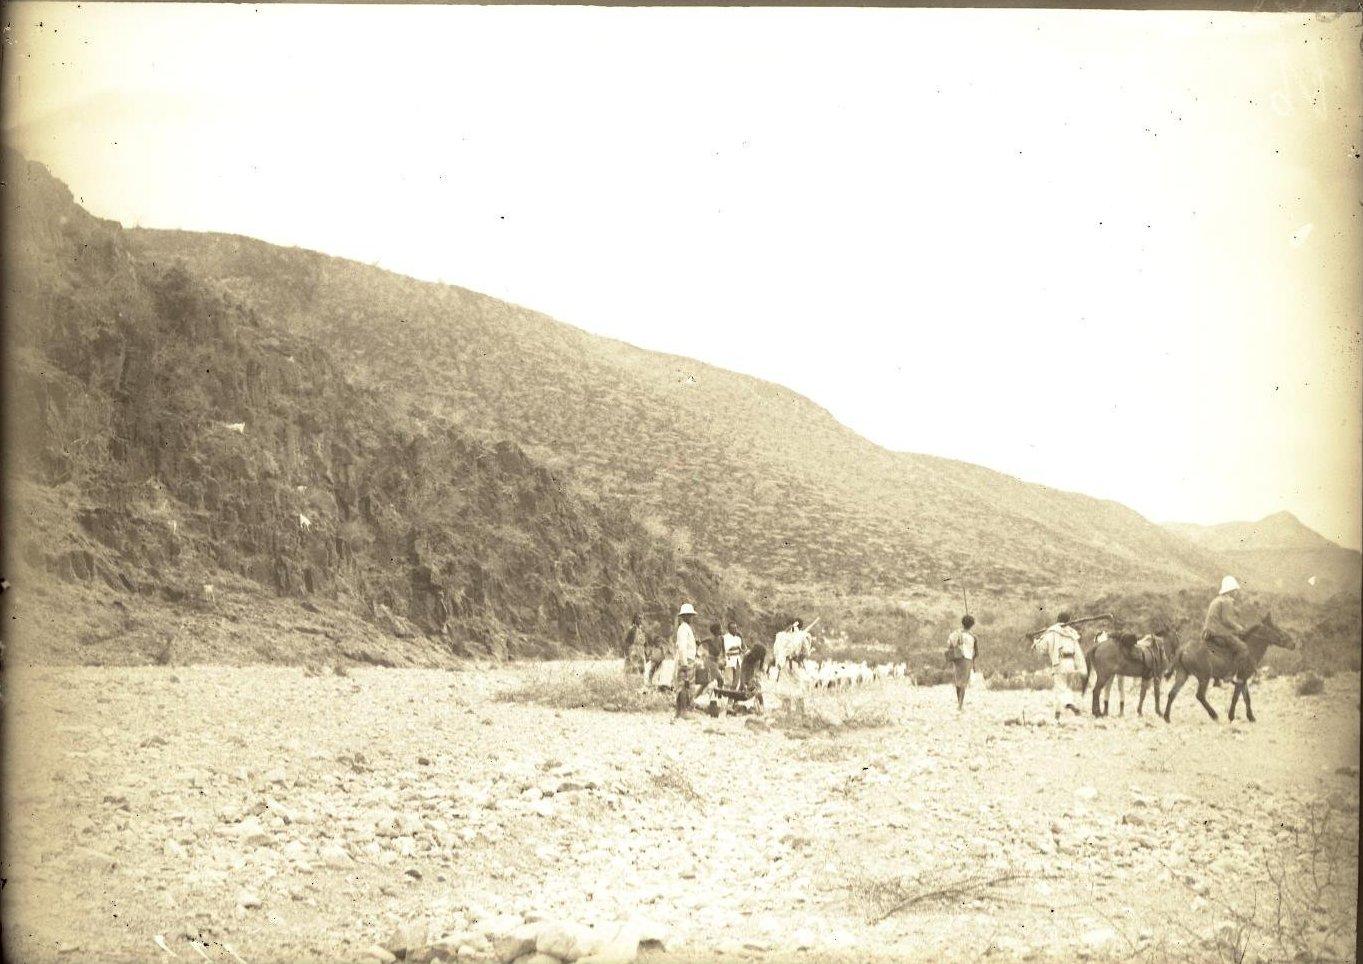 139. В сомалийской пустыне. Алиаде (общий вид каравана)